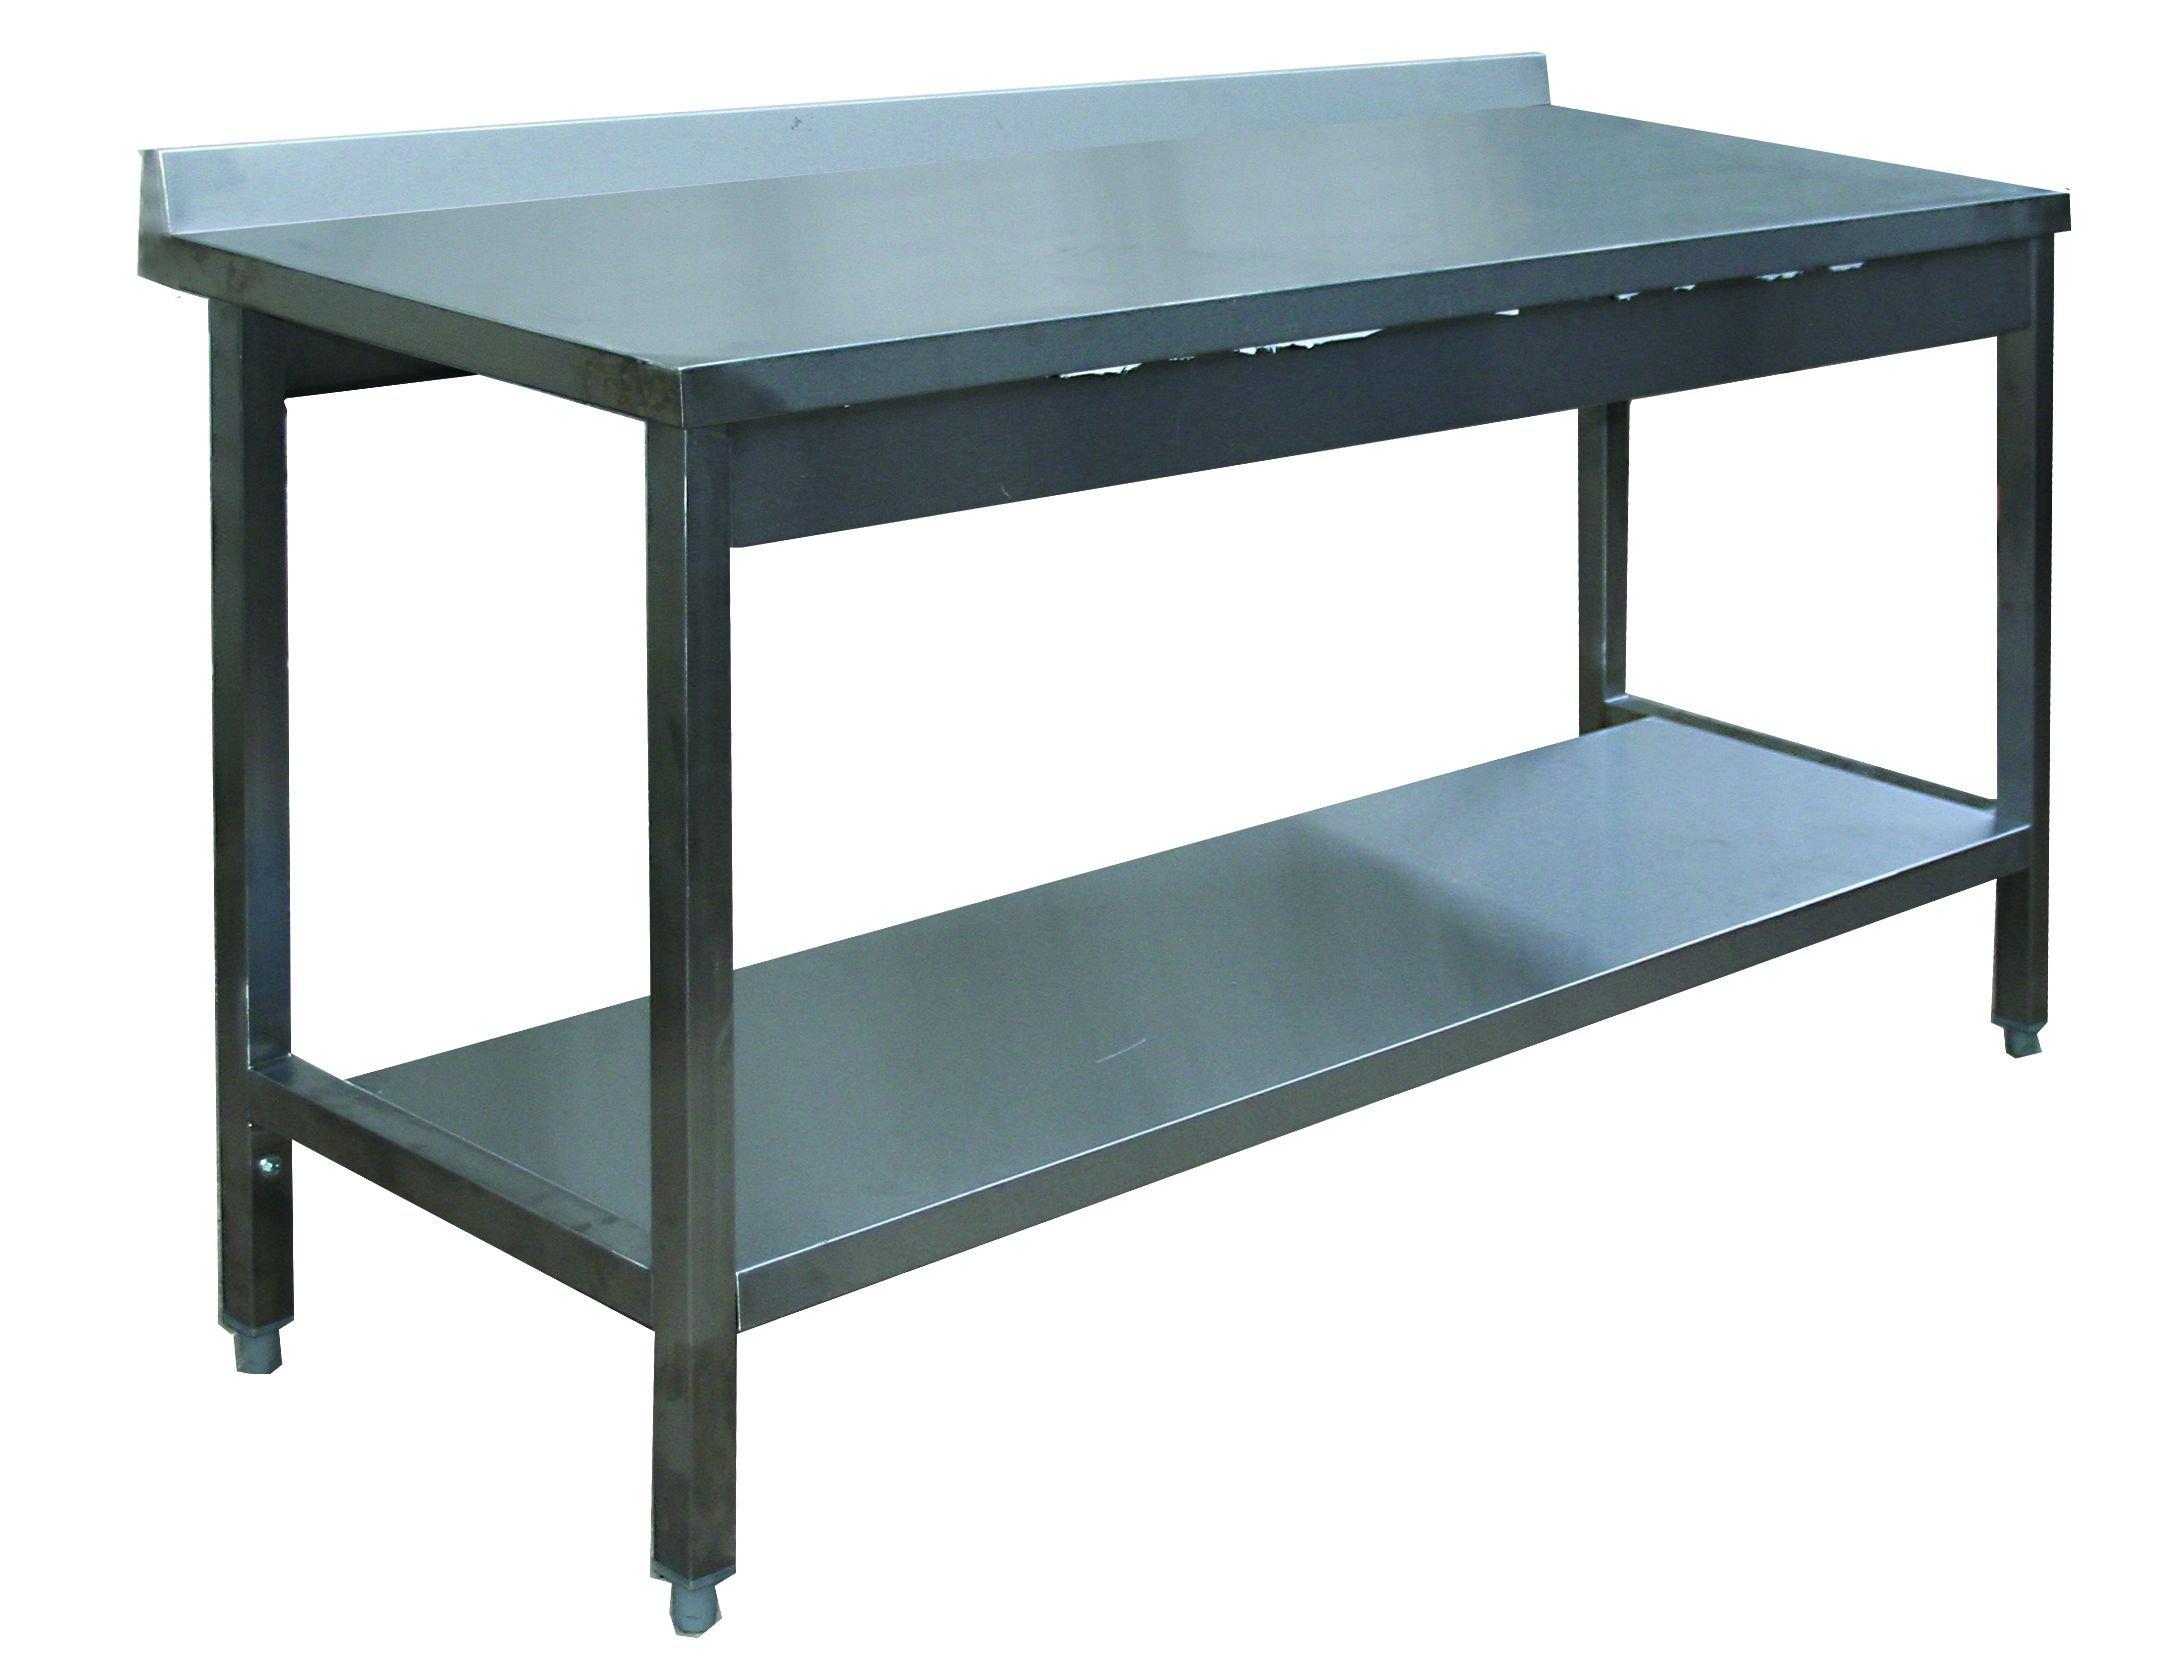 Stainless Steel Table Sink : Steel Working Tables,Sinks,Shelves,Cupboards. - Buy Stainless Steel ...